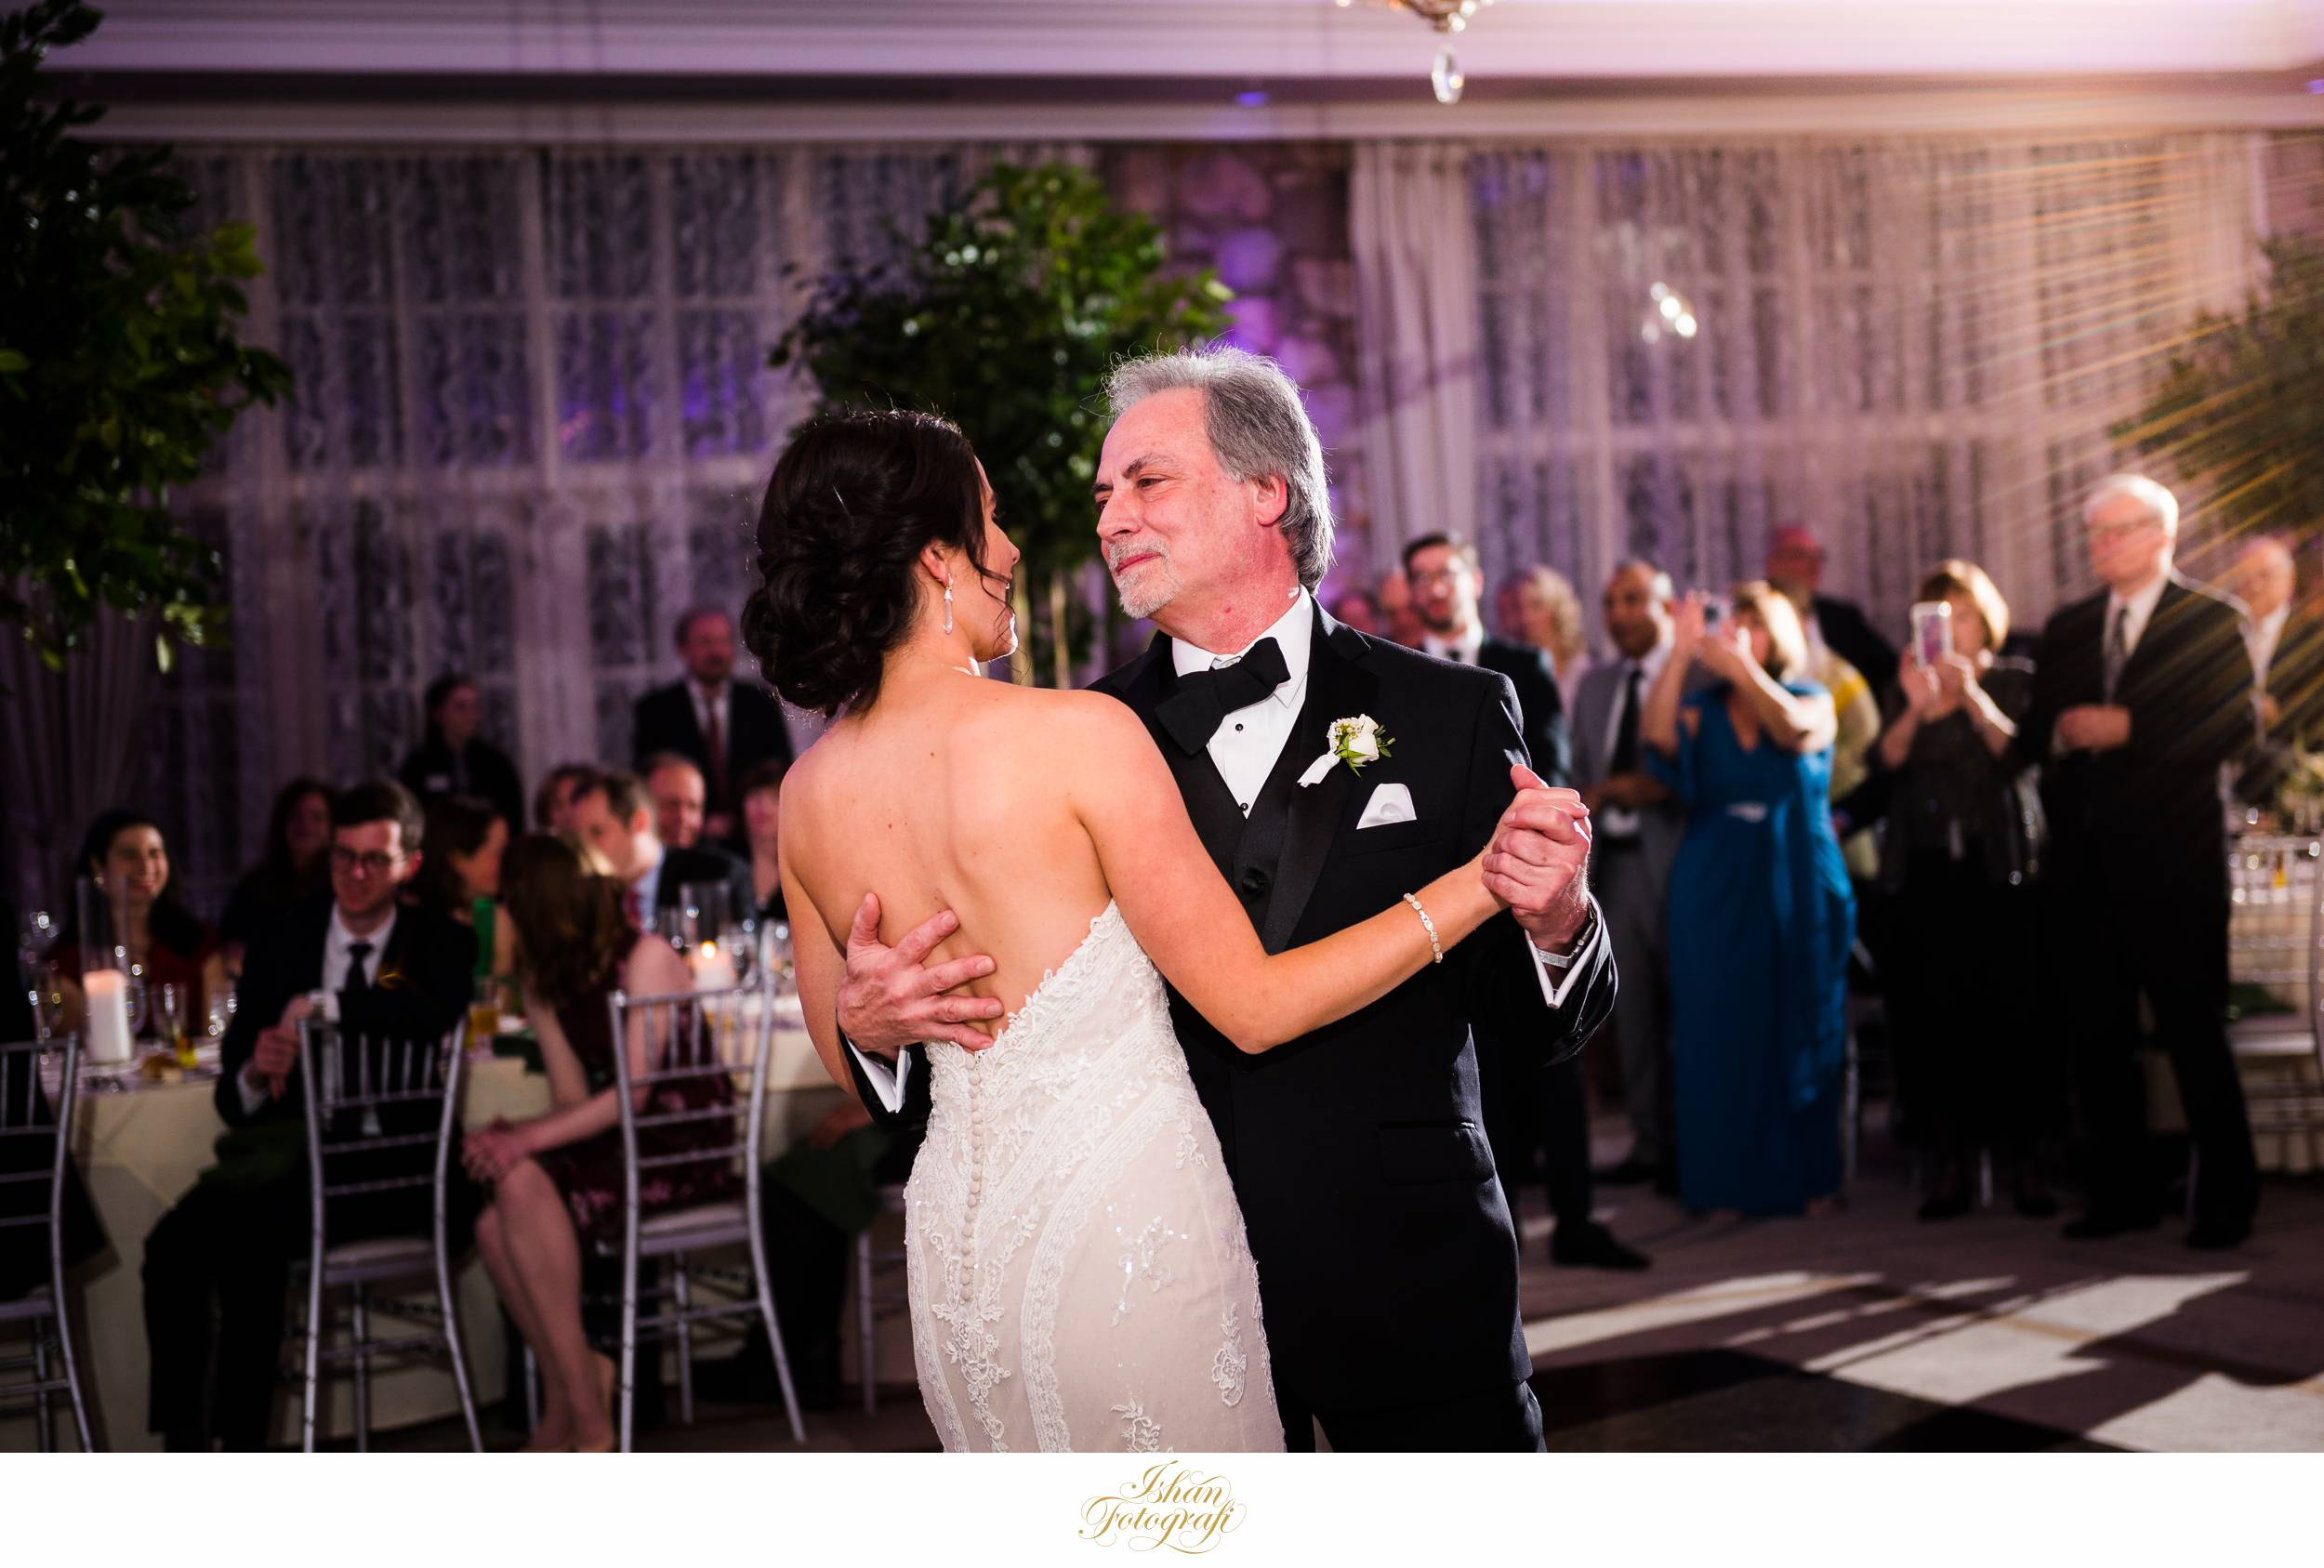 wedding-reception-photos-fiddler's-elbow-country-club-nj